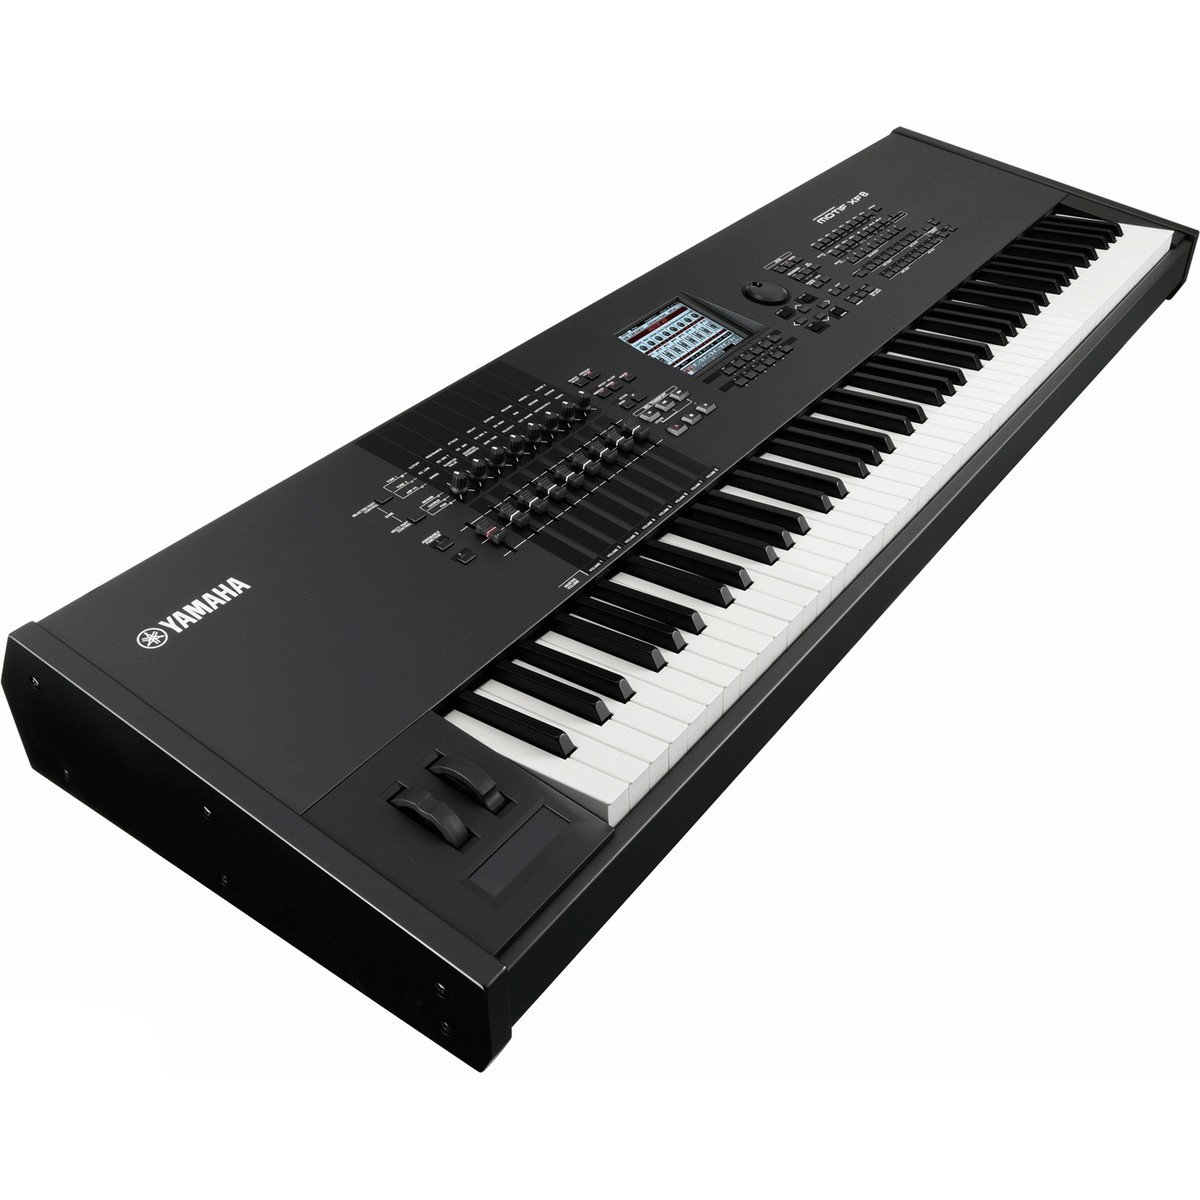 Latest Yamaha Keyboard Workstation : yamaha motif xf8 keyboard workstation nearly new at gear4music ~ Russianpoet.info Haus und Dekorationen